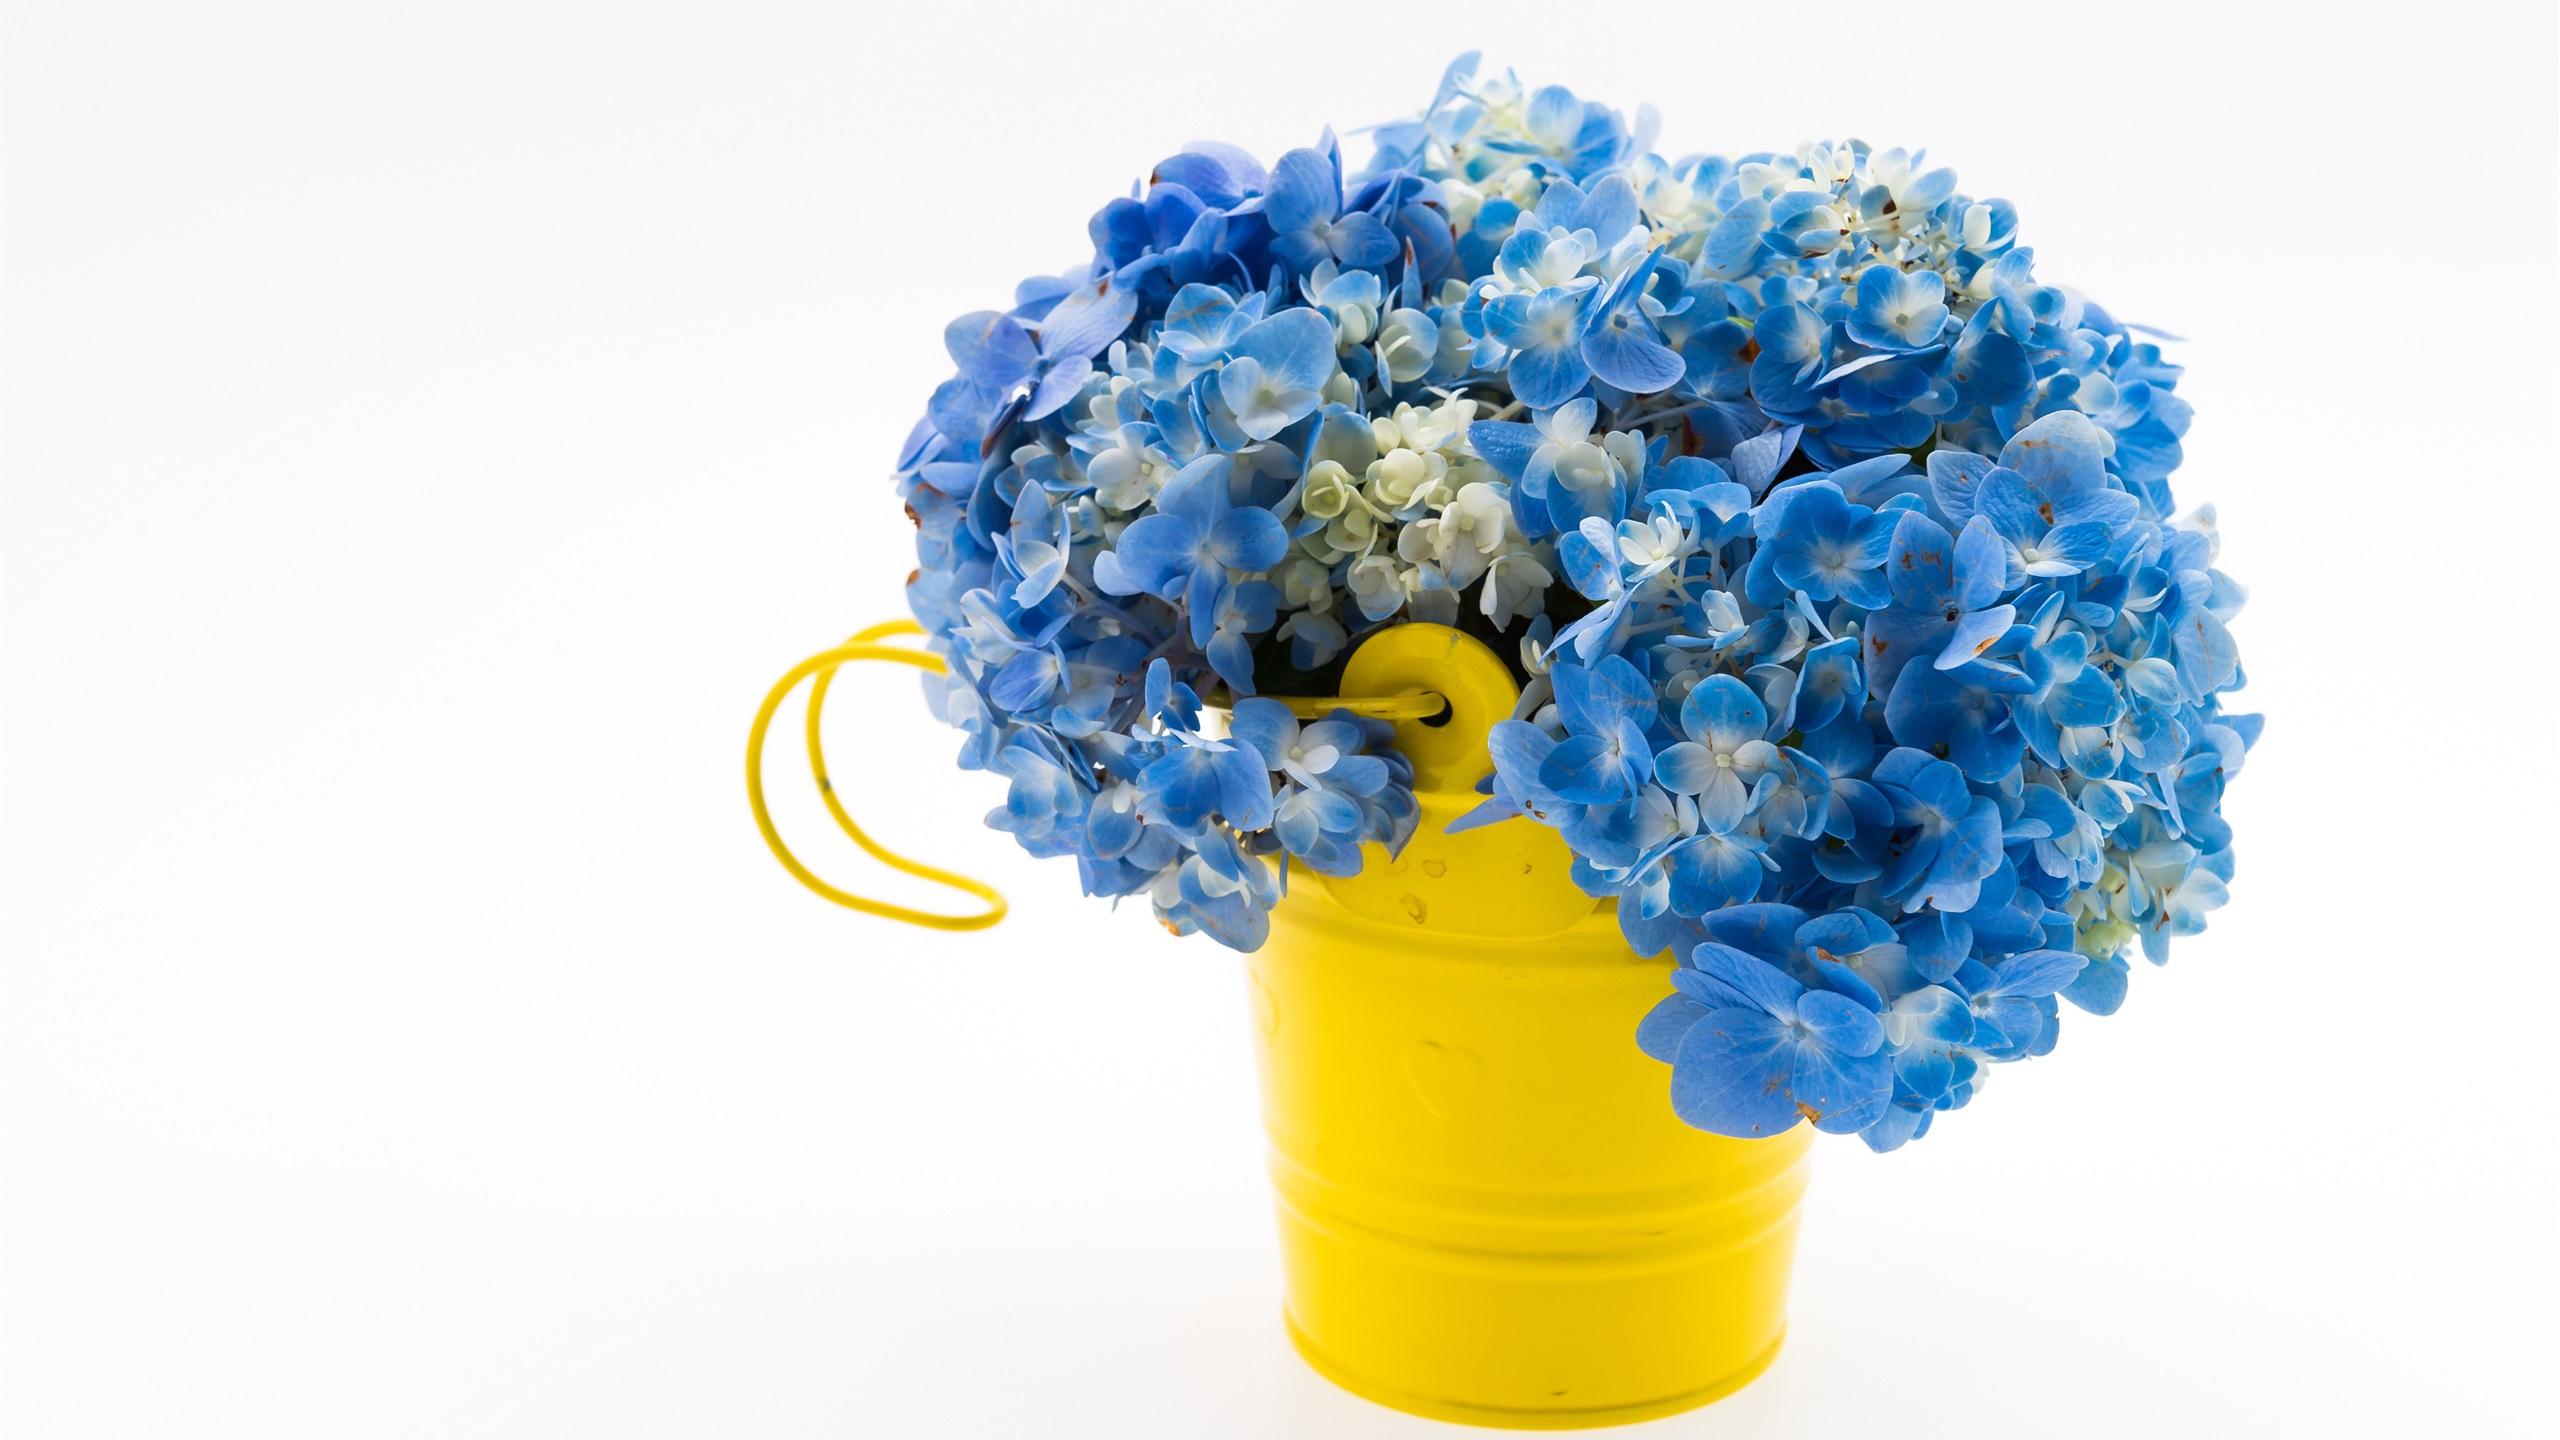 Fonds Décran Hortensia Bleu Bouquet Seau Jaune Fond